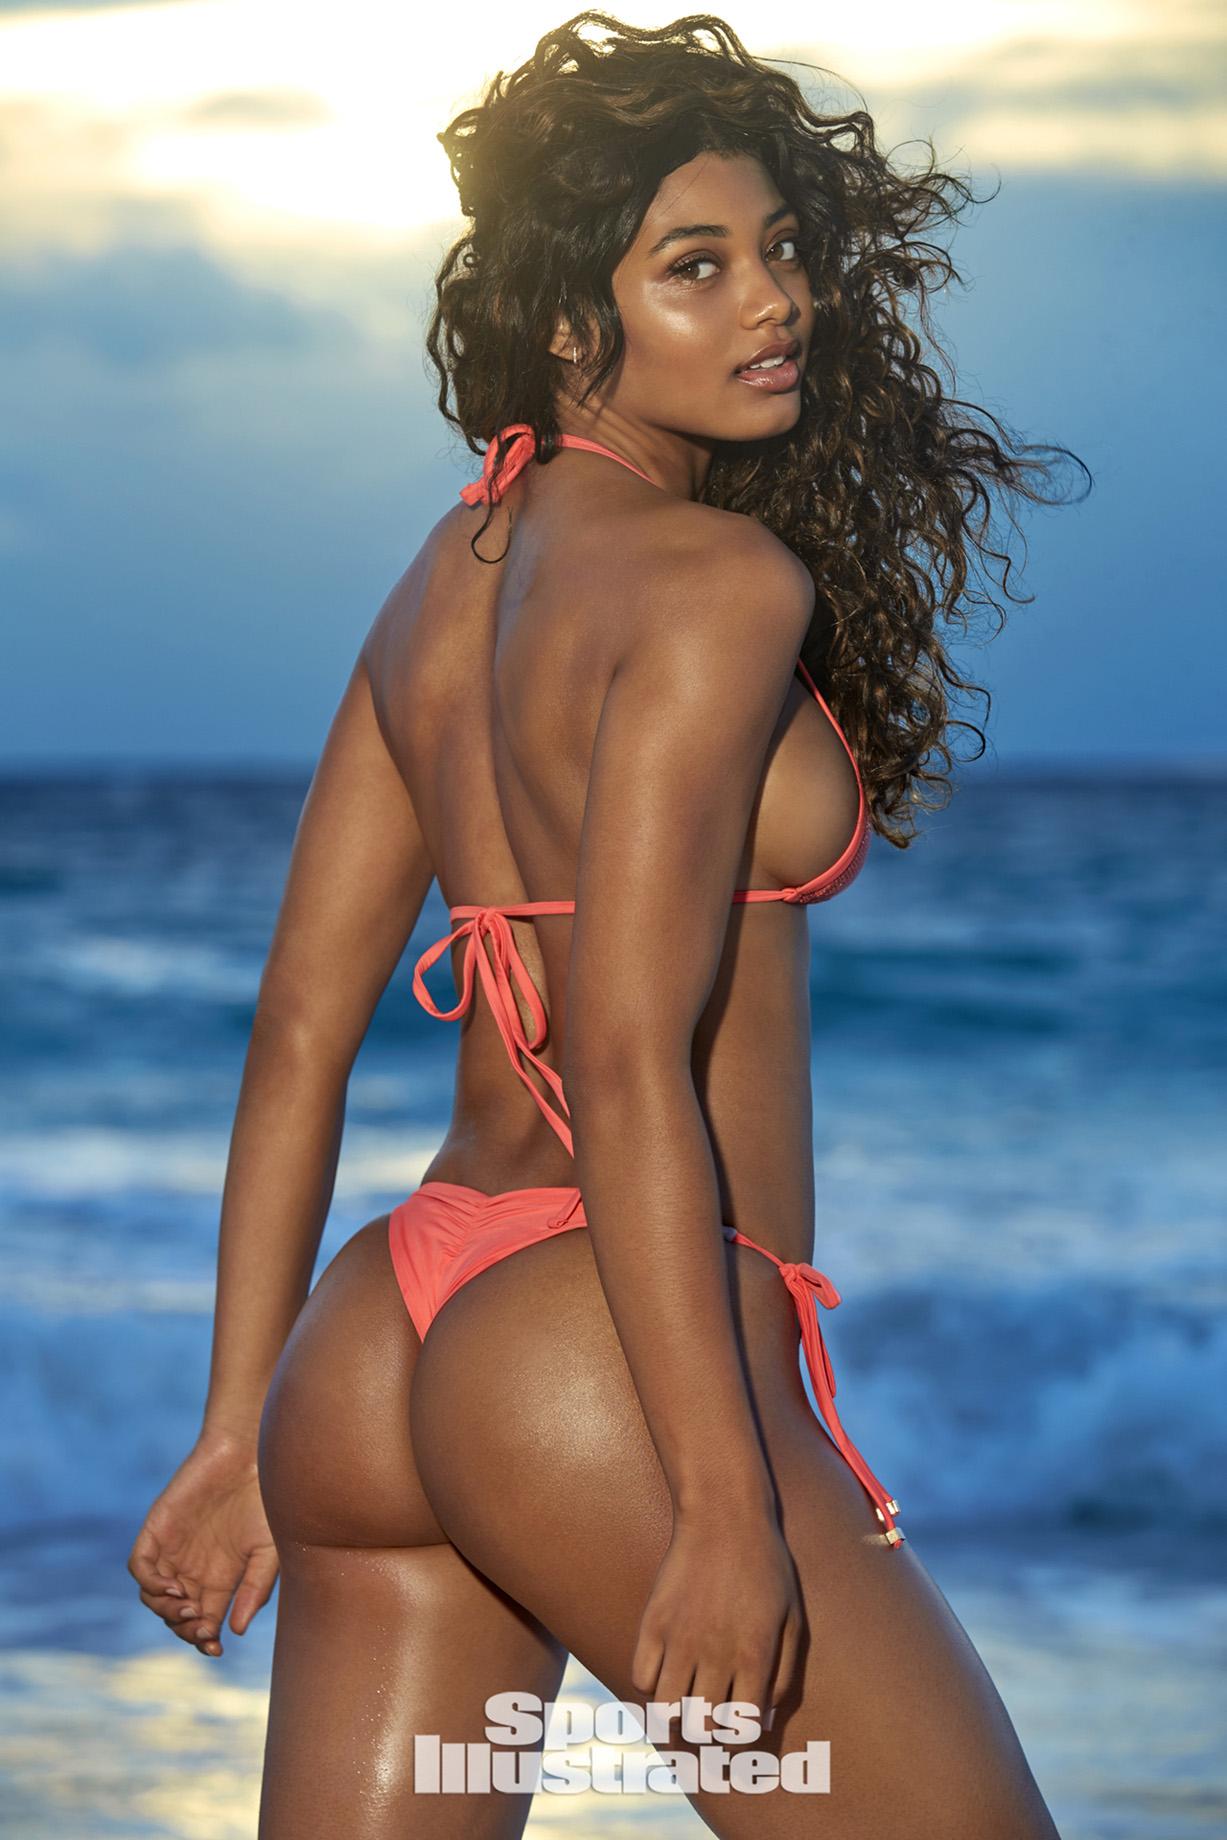 Danielle Herrington / Даниэль Херрингтон в купальниках из новой коллекции Sports Illustrated Swimsuit 2018 issue / in the Bahamas by Ben Watts